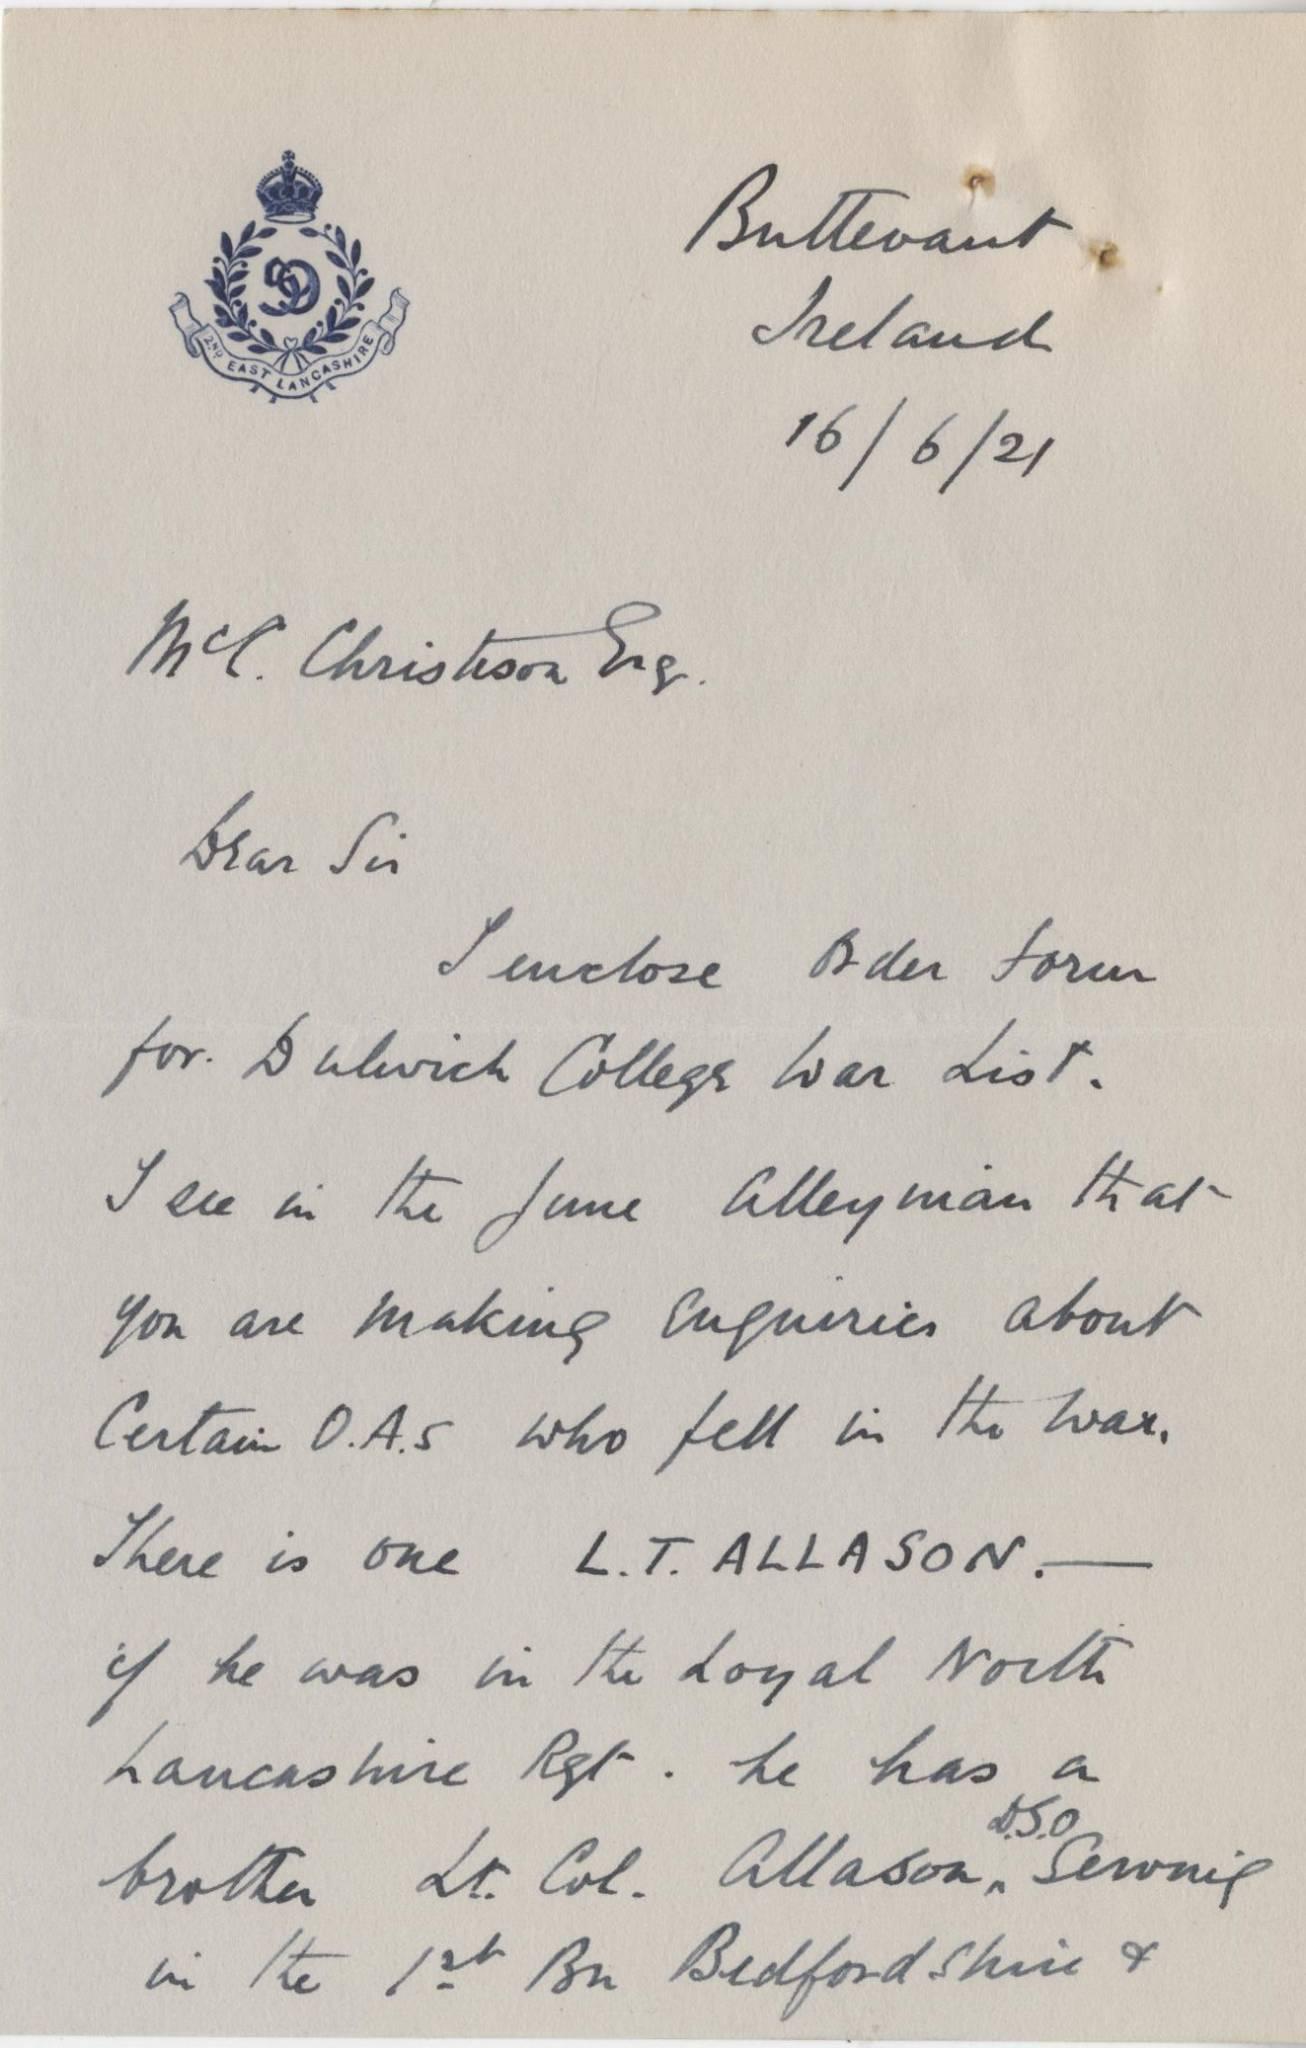 Allason LT Shortland Letter 1